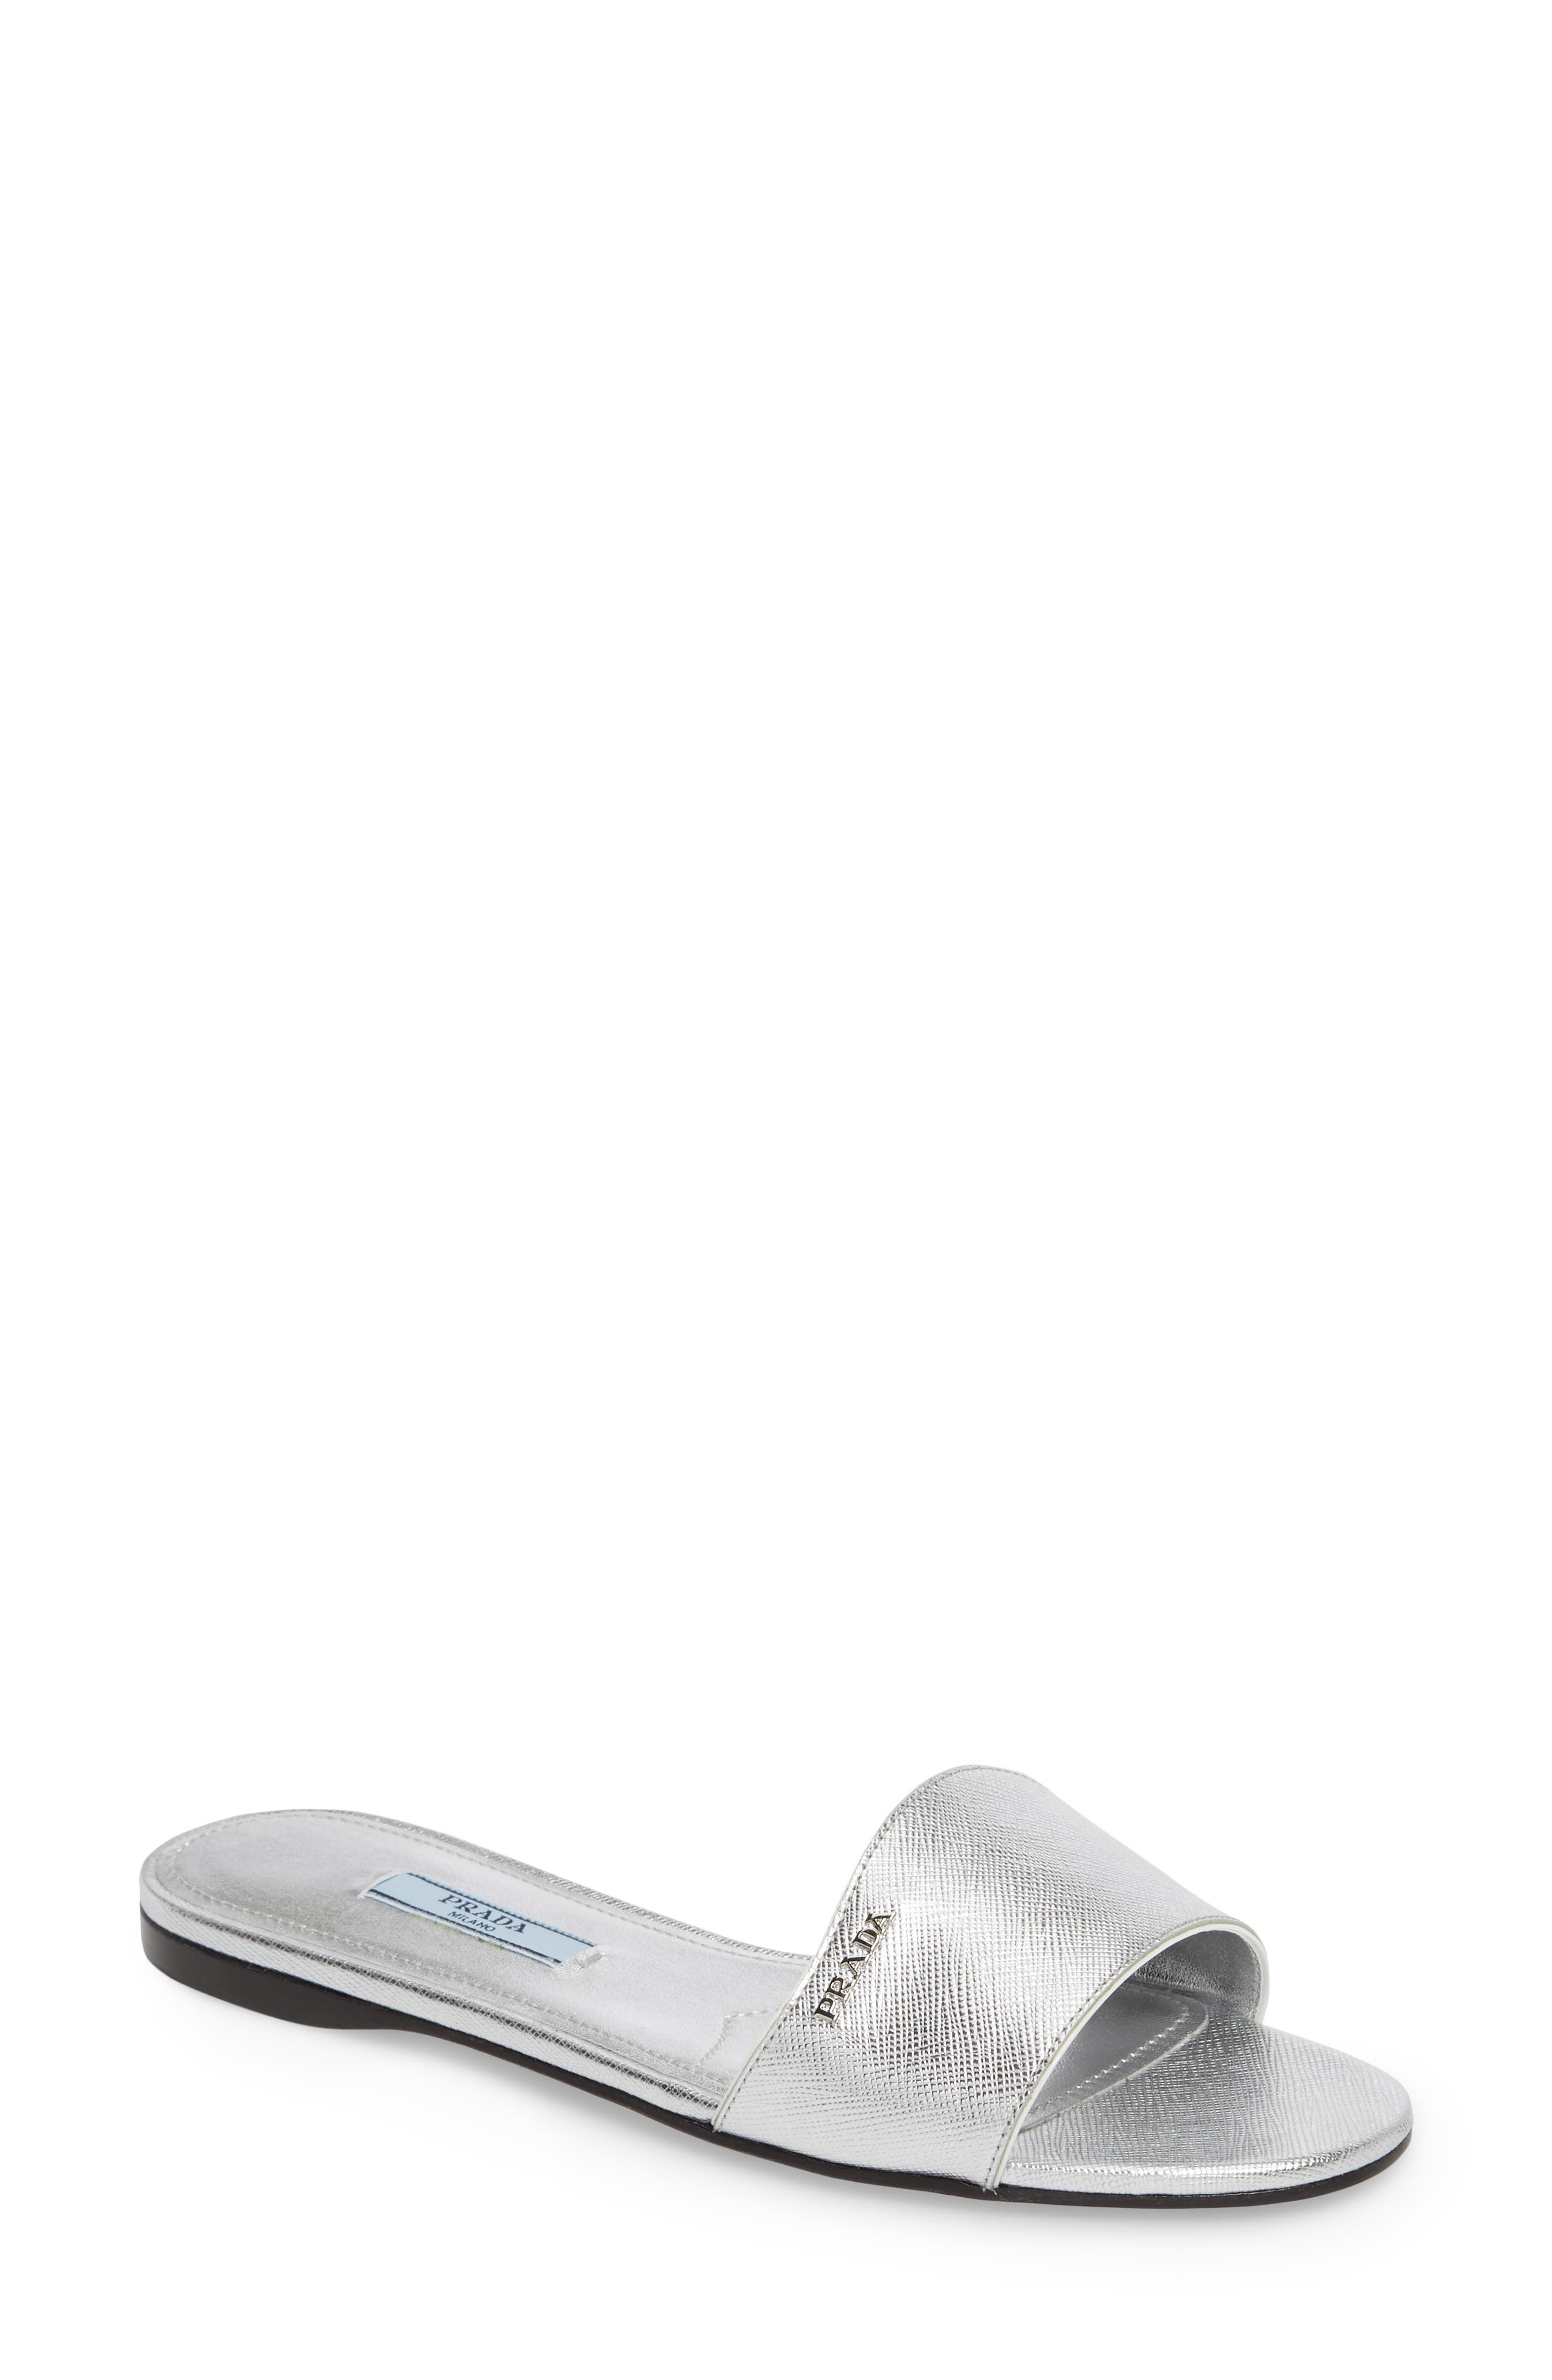 Slide Sandal,                             Main thumbnail 1, color,                             Silver